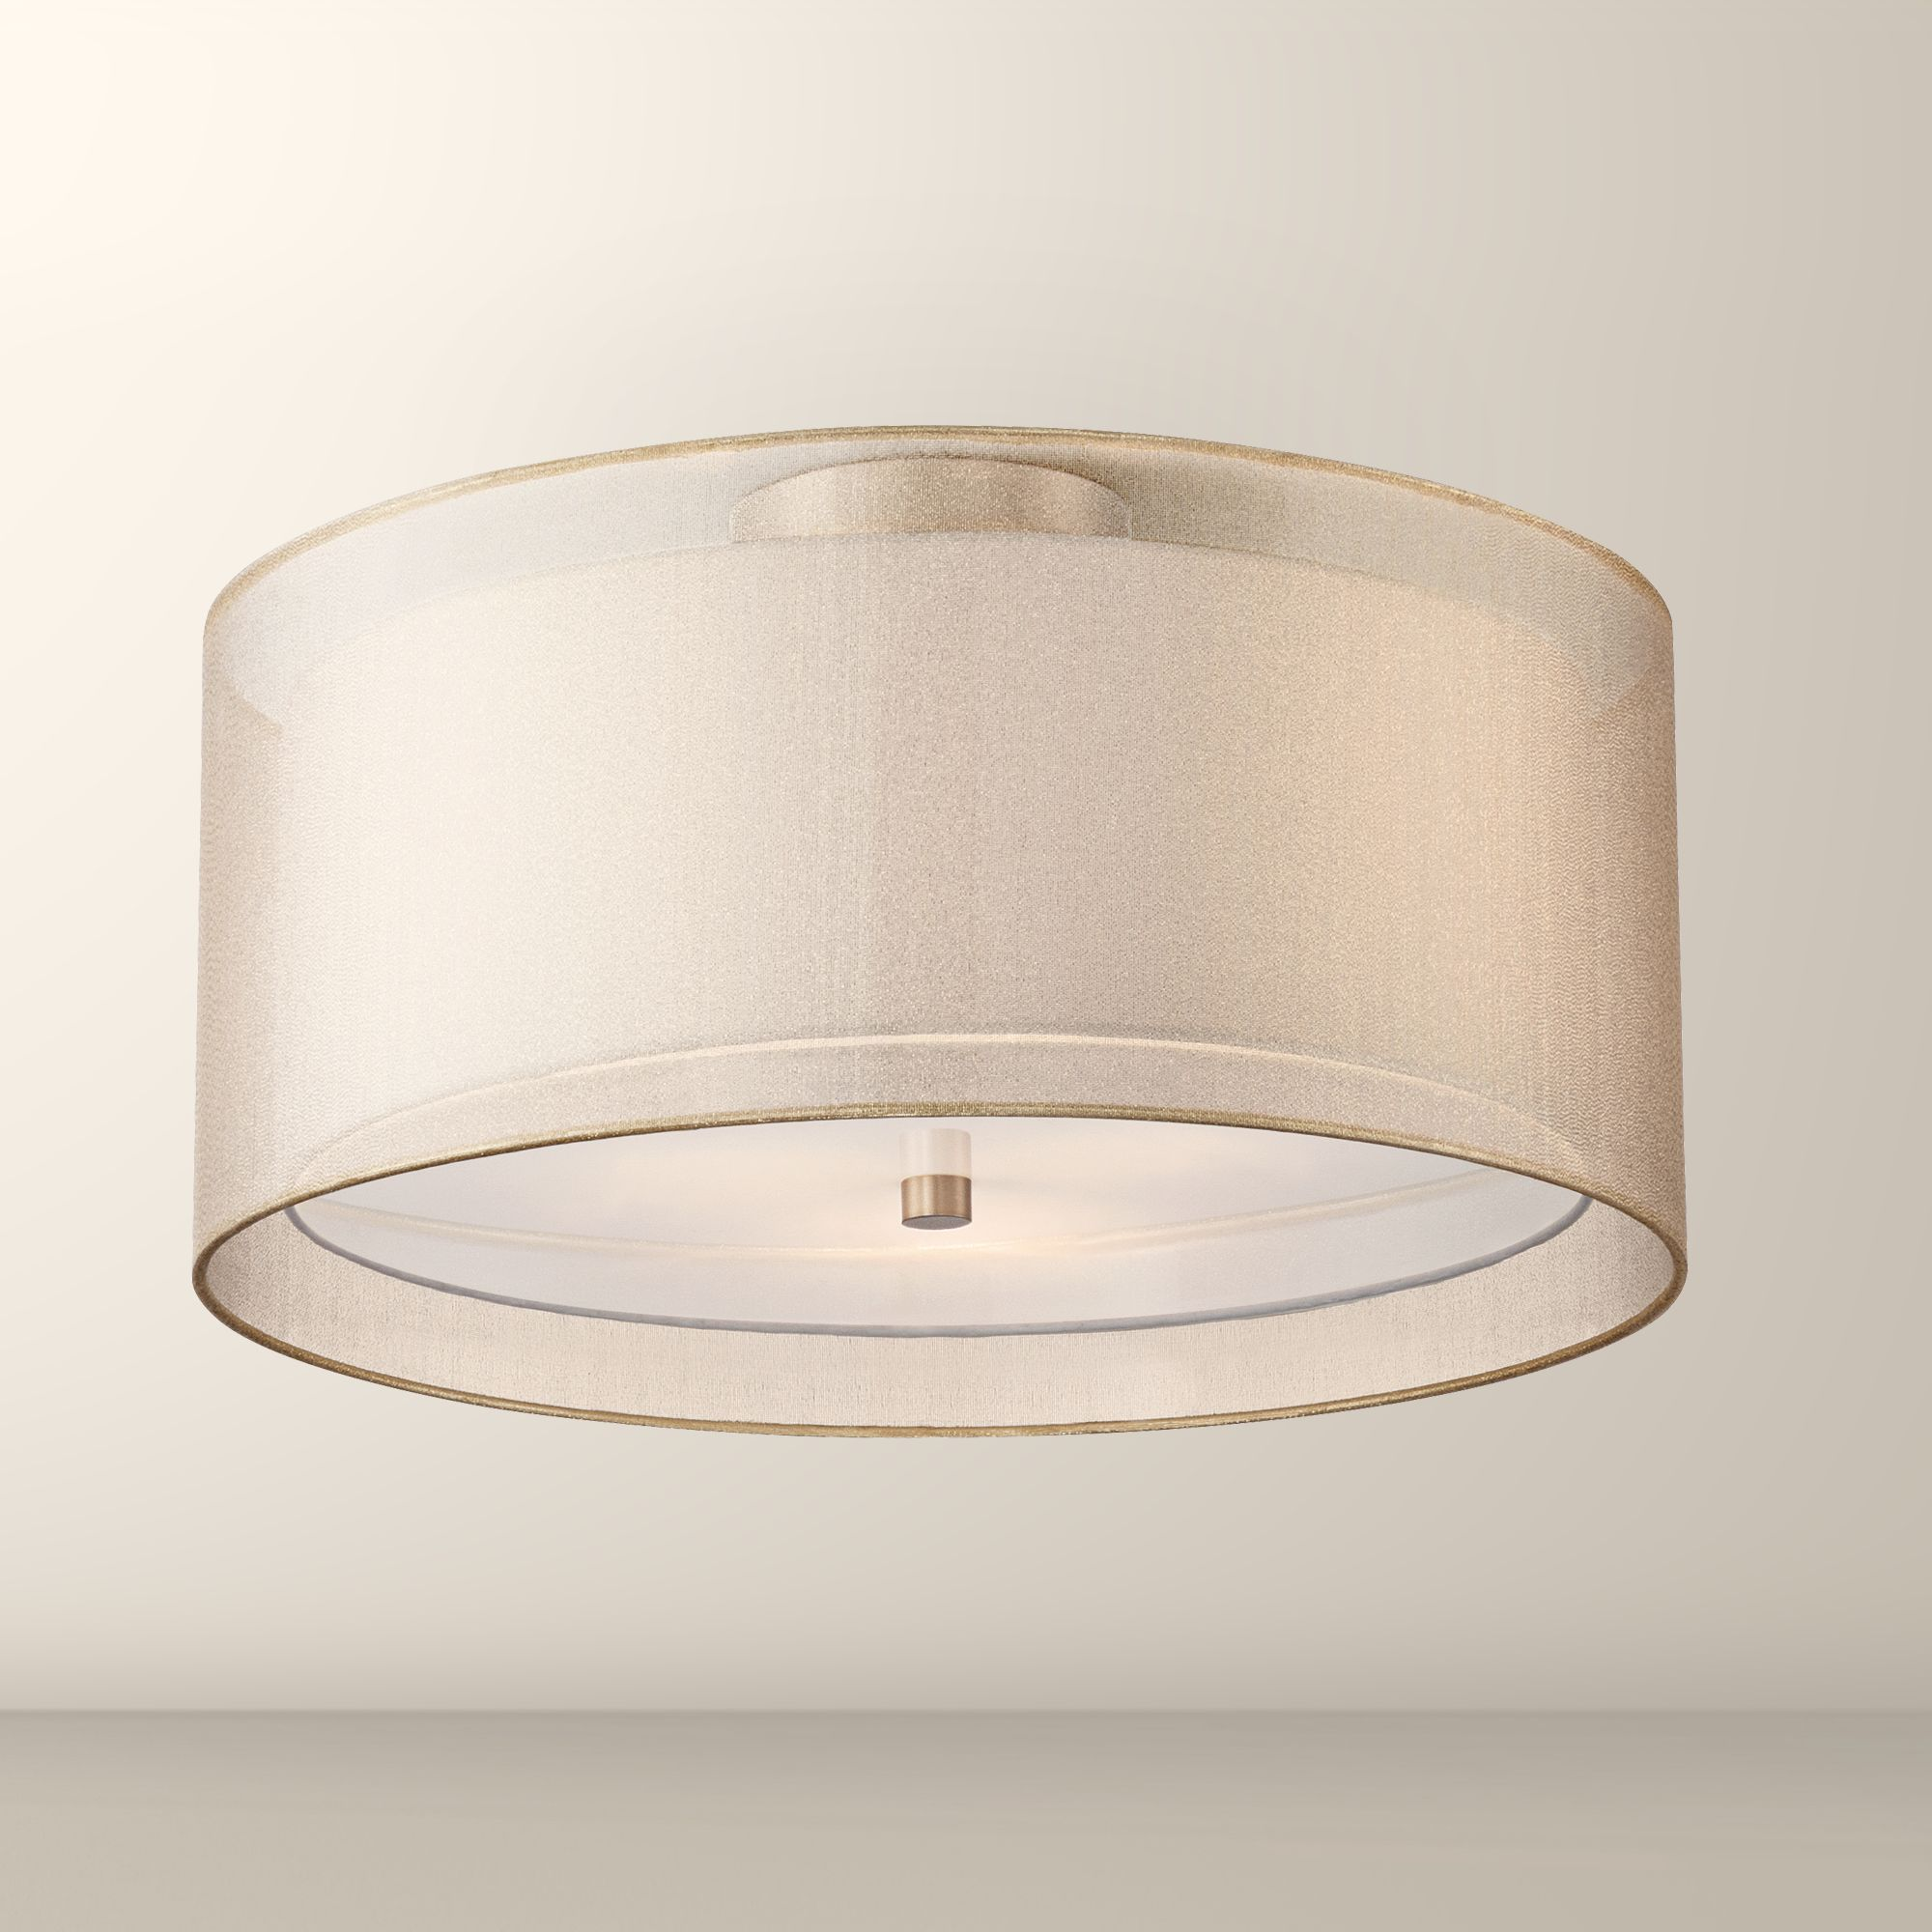 Possini Euro Double Drum Champagne Ceiling Light Eu1f072 Euro